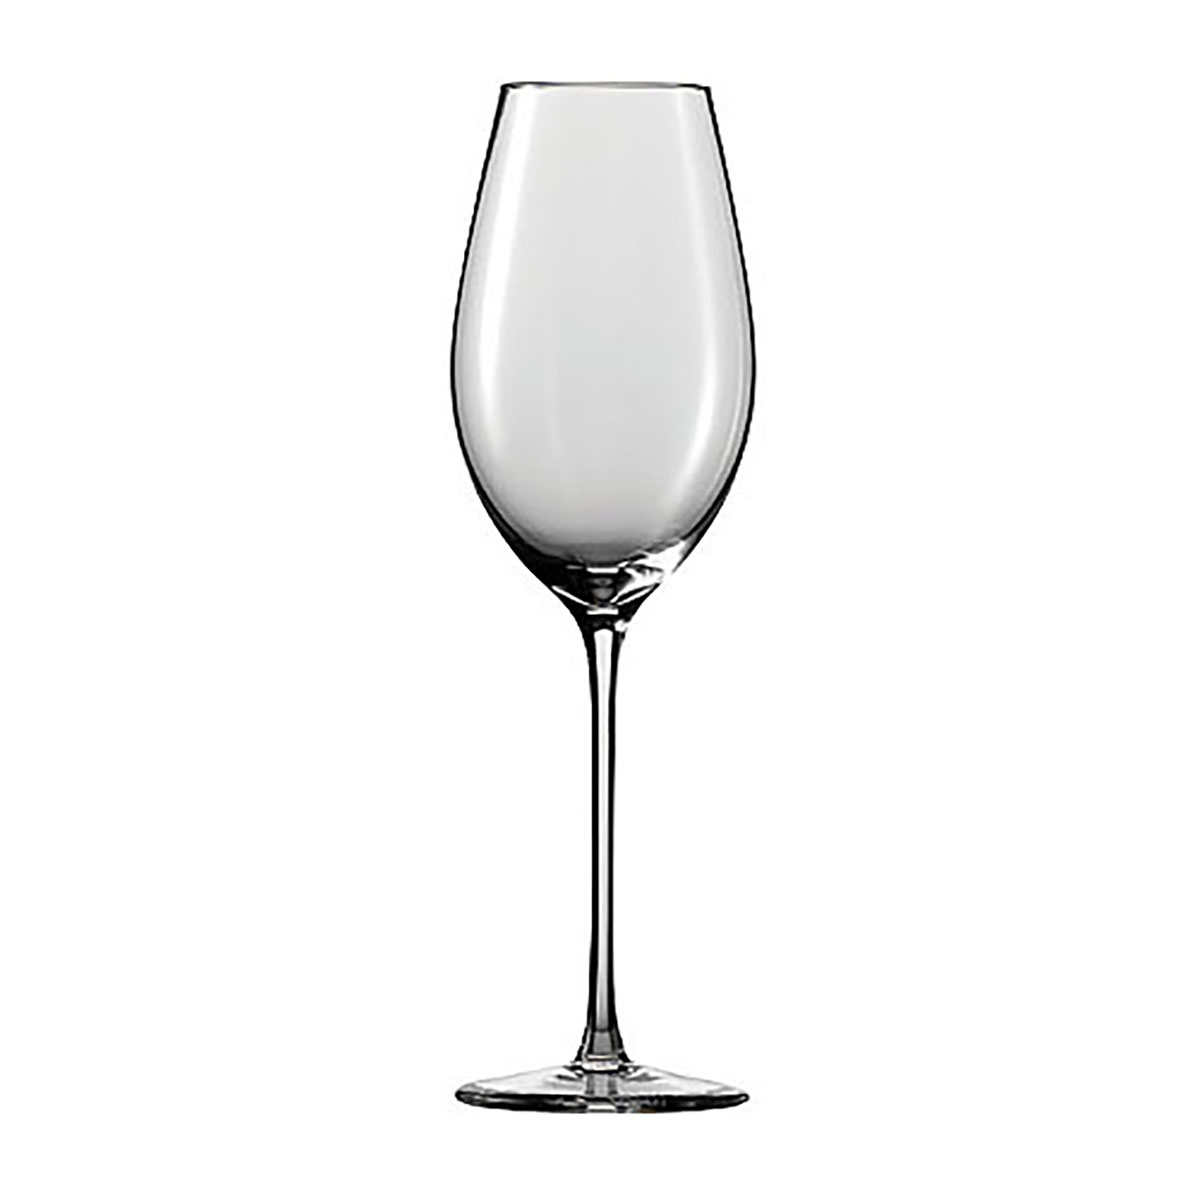 Schott Zwiesel 1872 Enoteca Sherry Glass, Set of Six